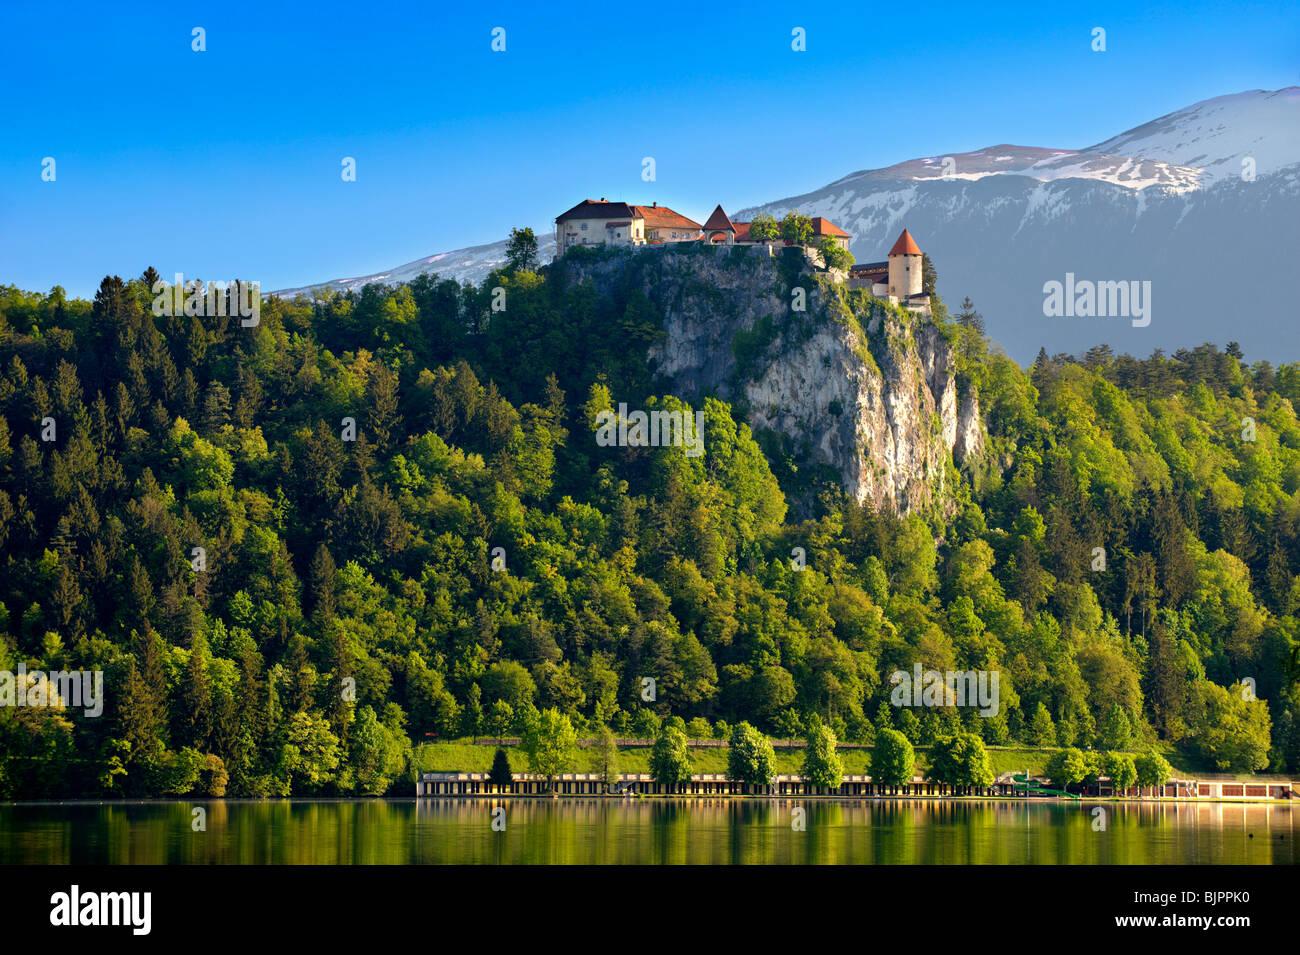 Bled Castle. Bled Slovenia. - Stock Image